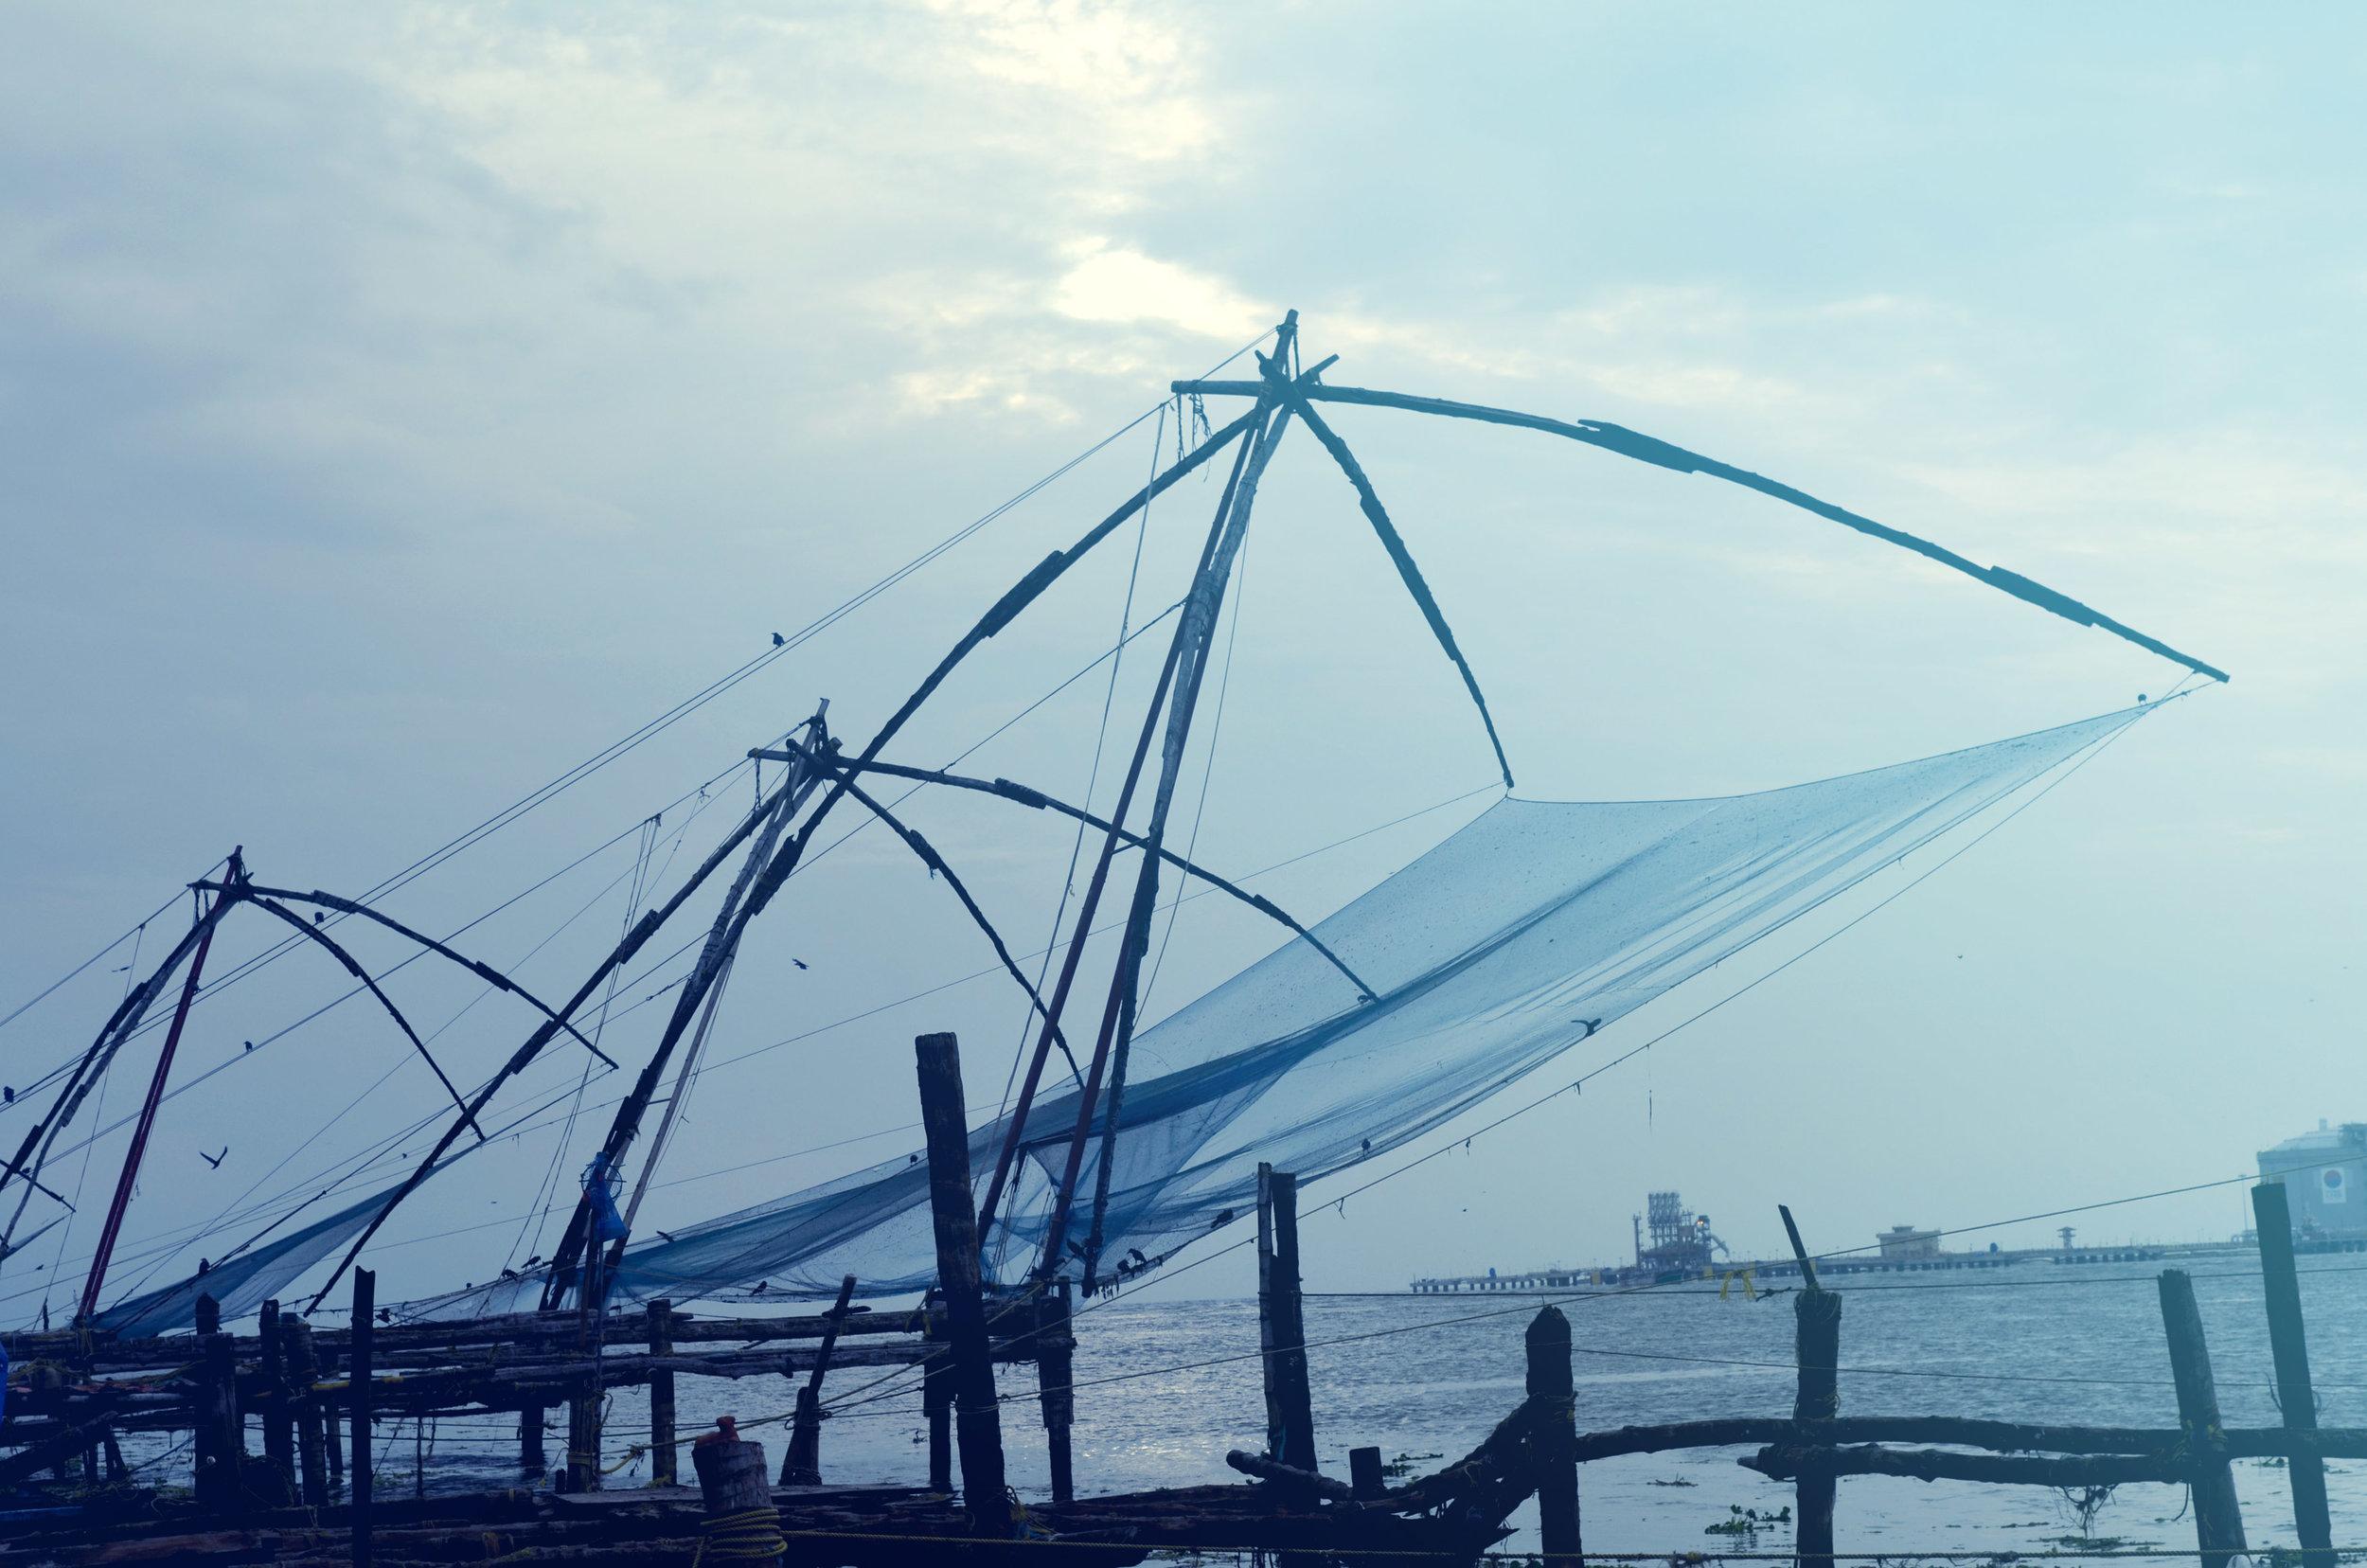 Chinese_fishing_nets_hires.jpg